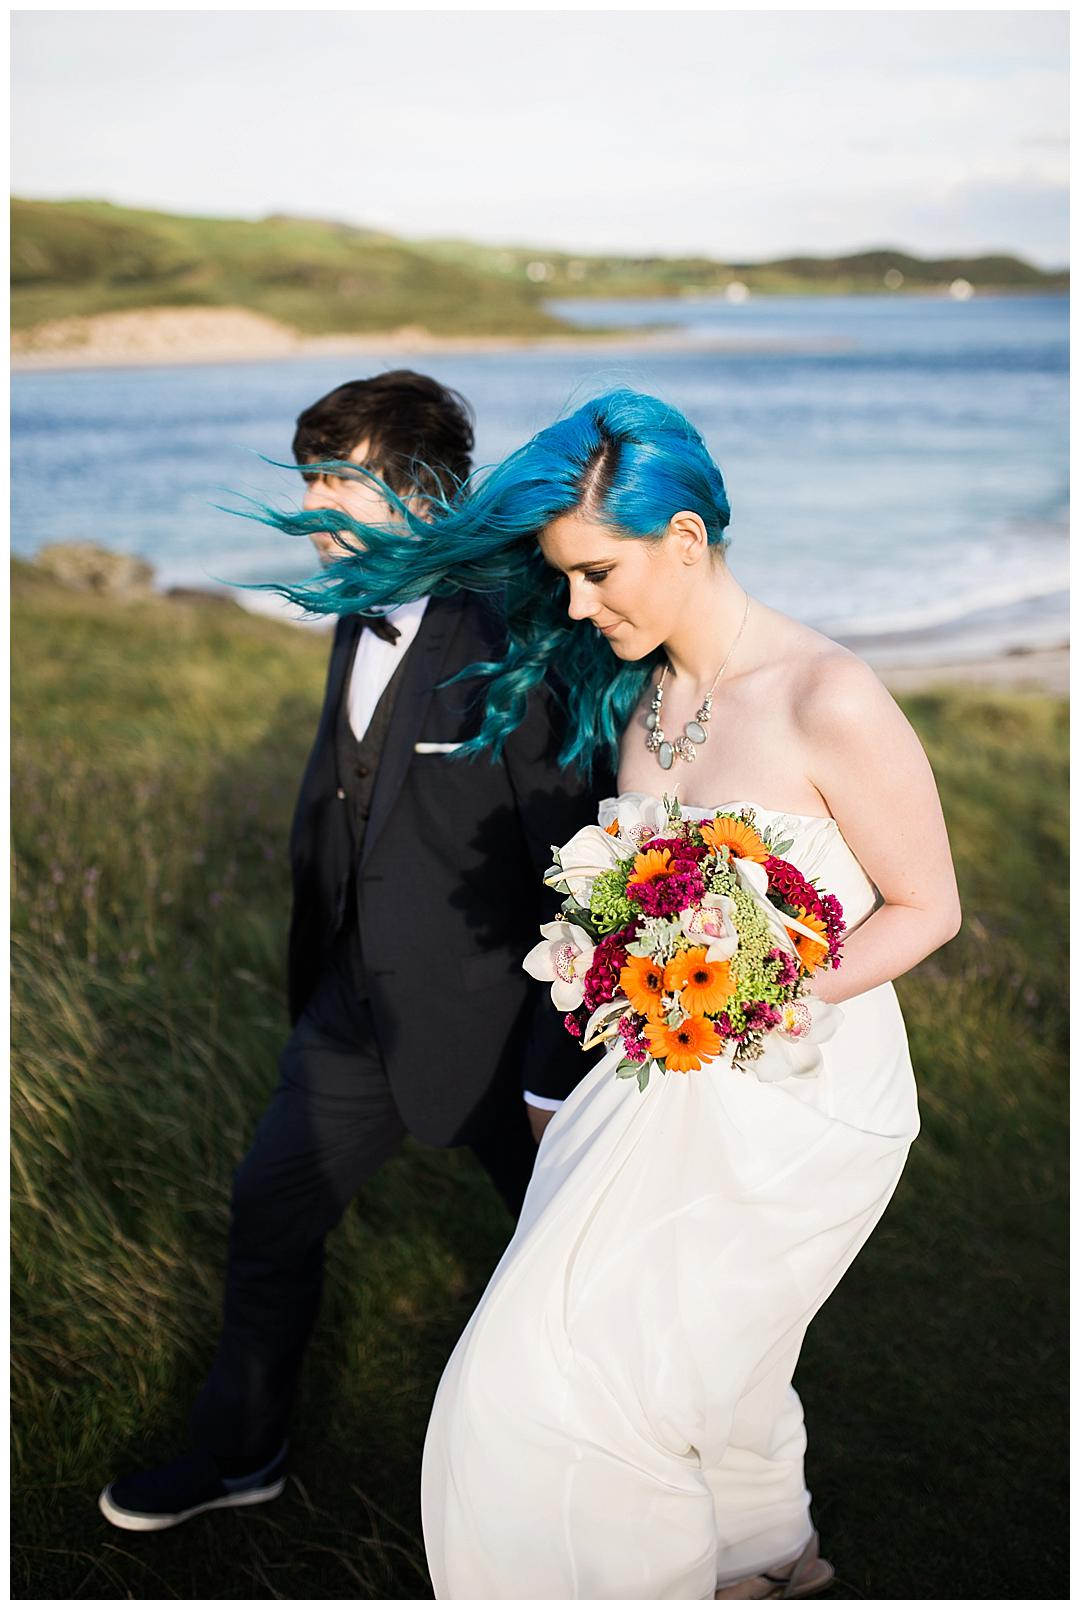 We_can _be_Heroes_alternative_wedding_photographer_Ireland_0074